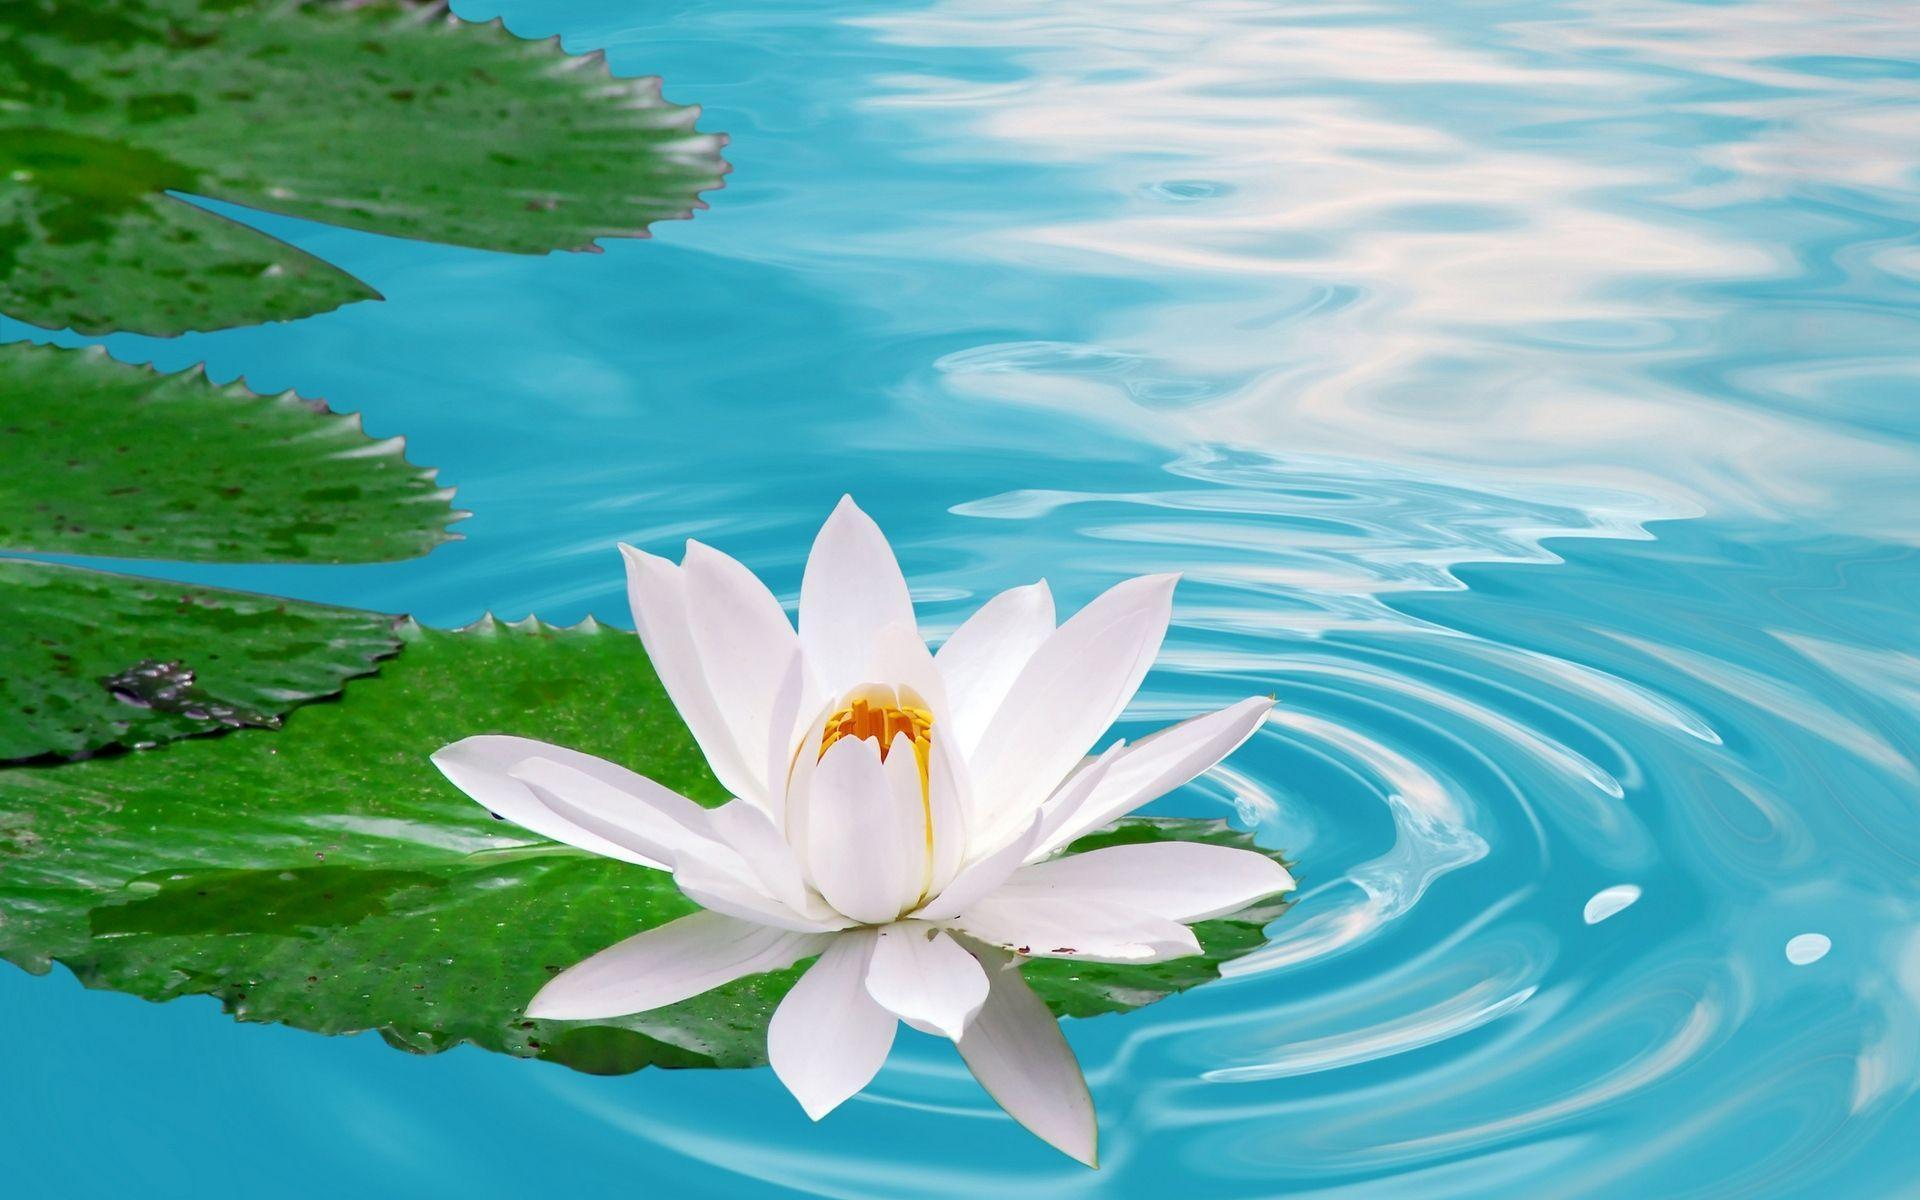 Lotus Flower Wallpapers 38 #25051 Wallpaper | Cariwall.